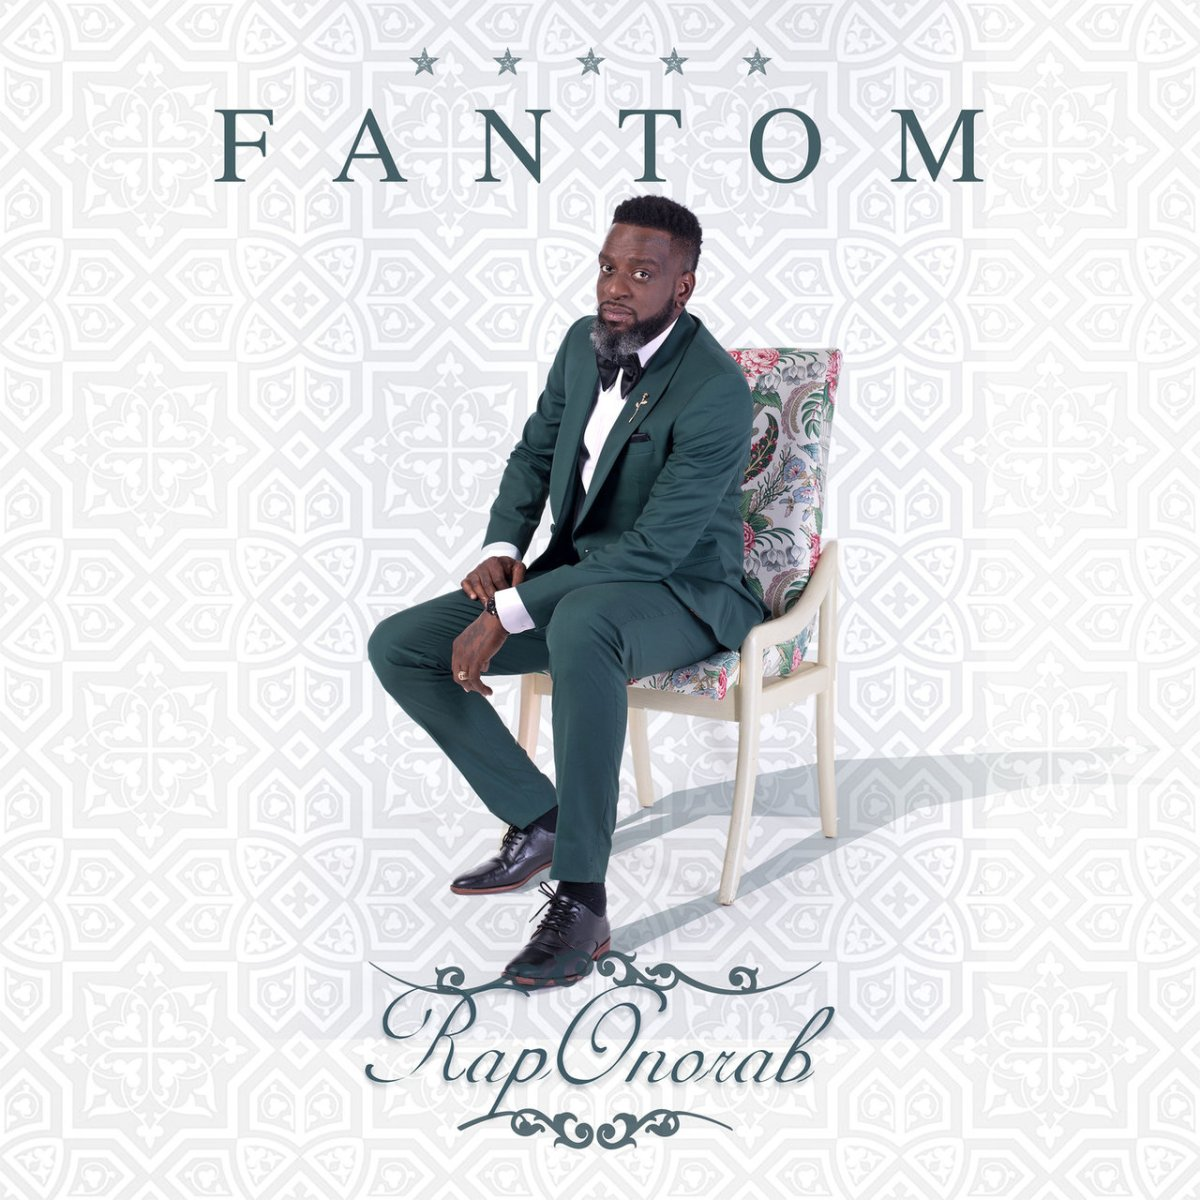 Fantom - Rap Onorab (Cover)